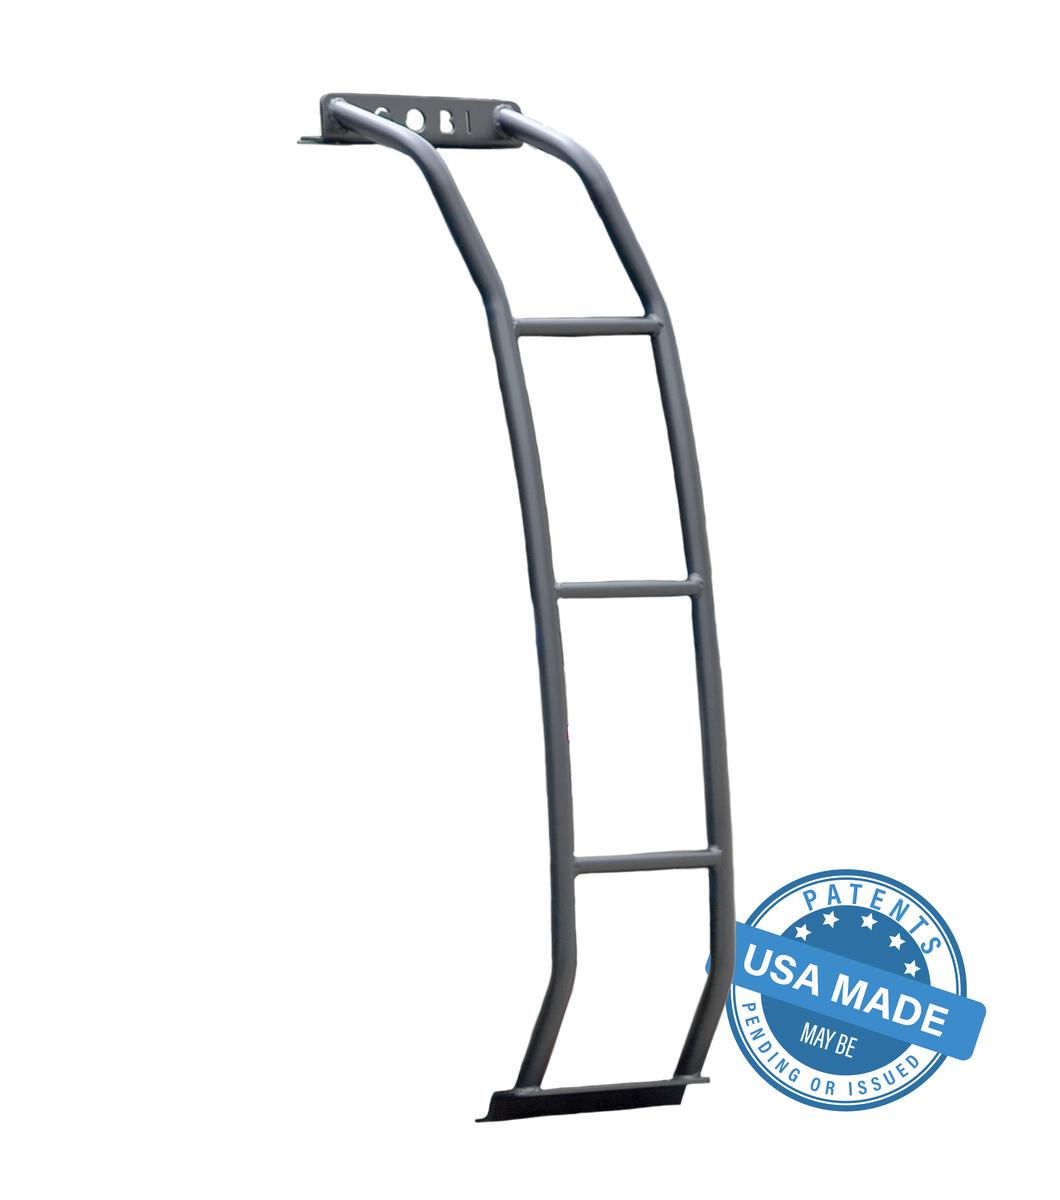 GOBI Nissan Xterra Rear Ladder Stealth/Ranger*